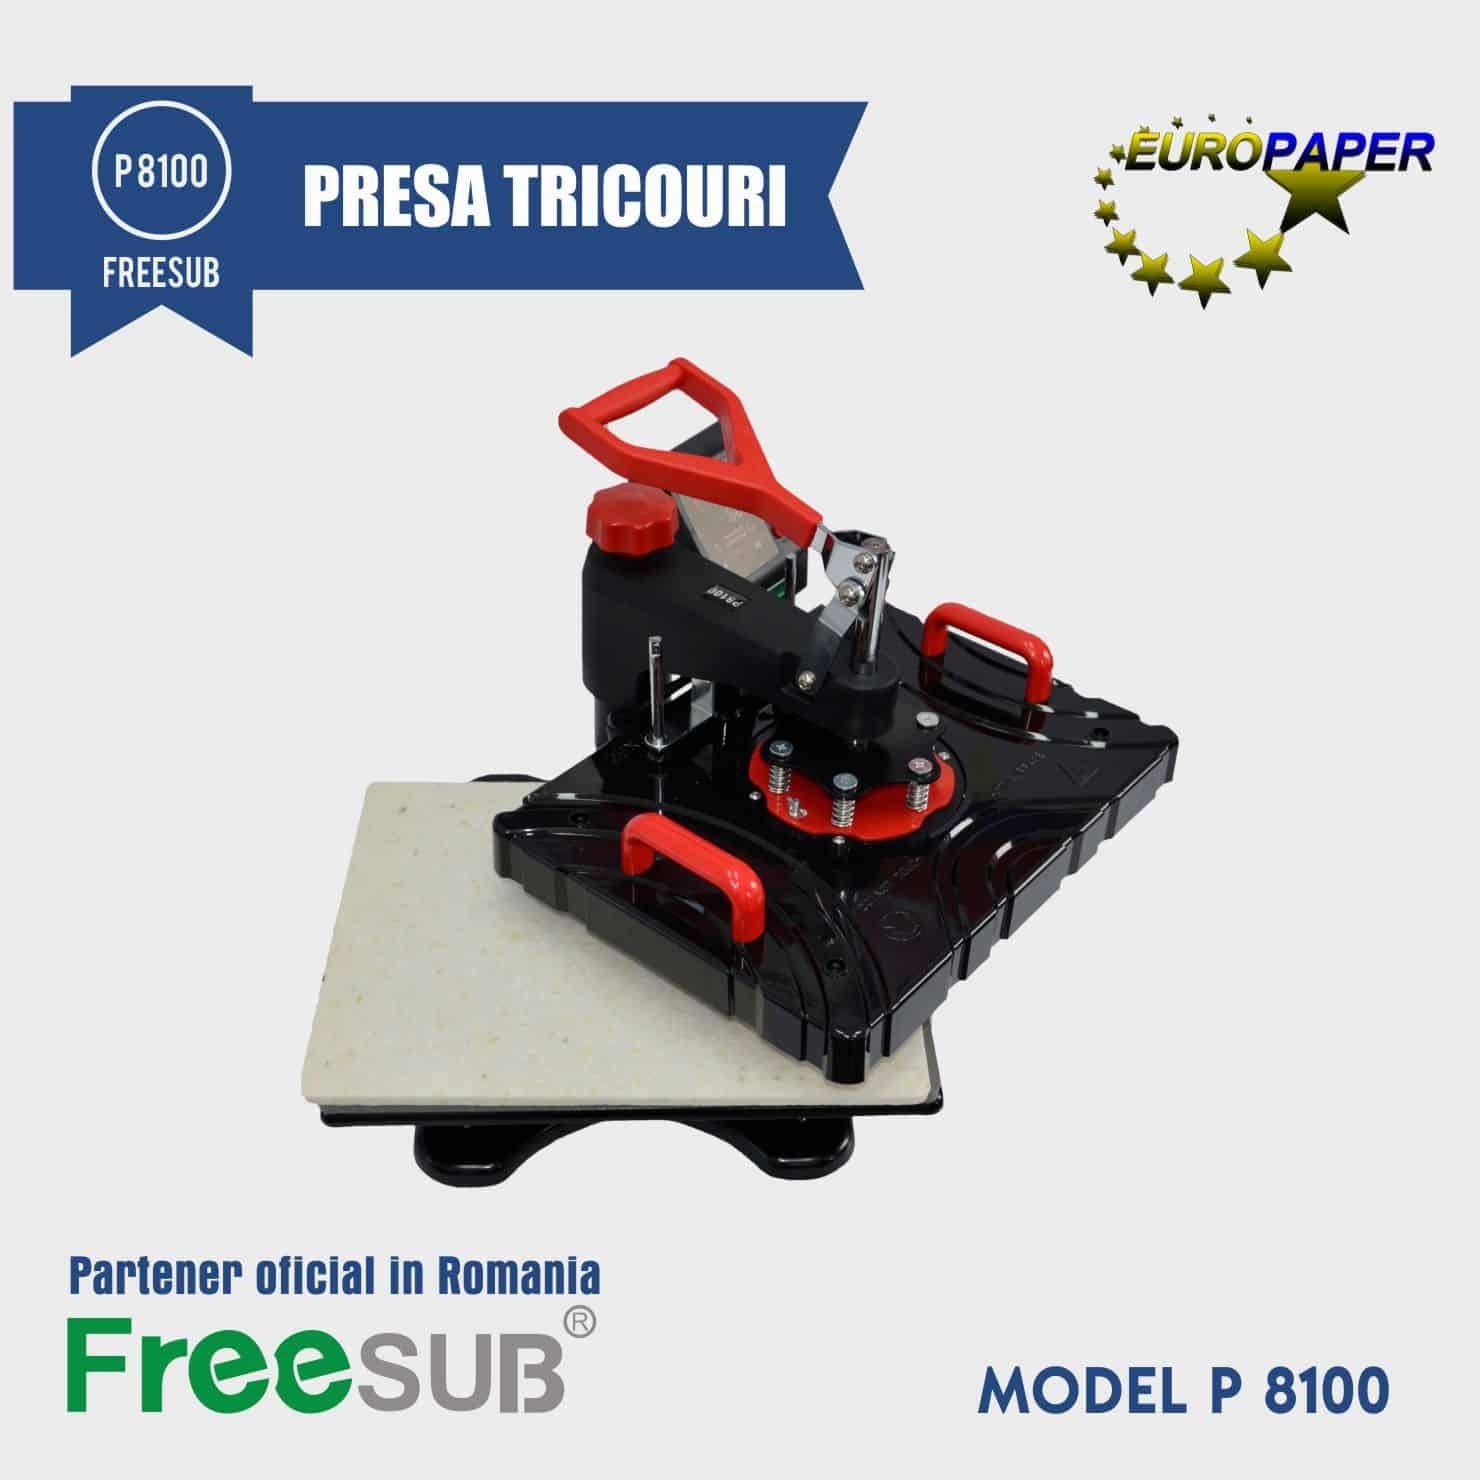 PRESA TRICOURI FREESUB P8100